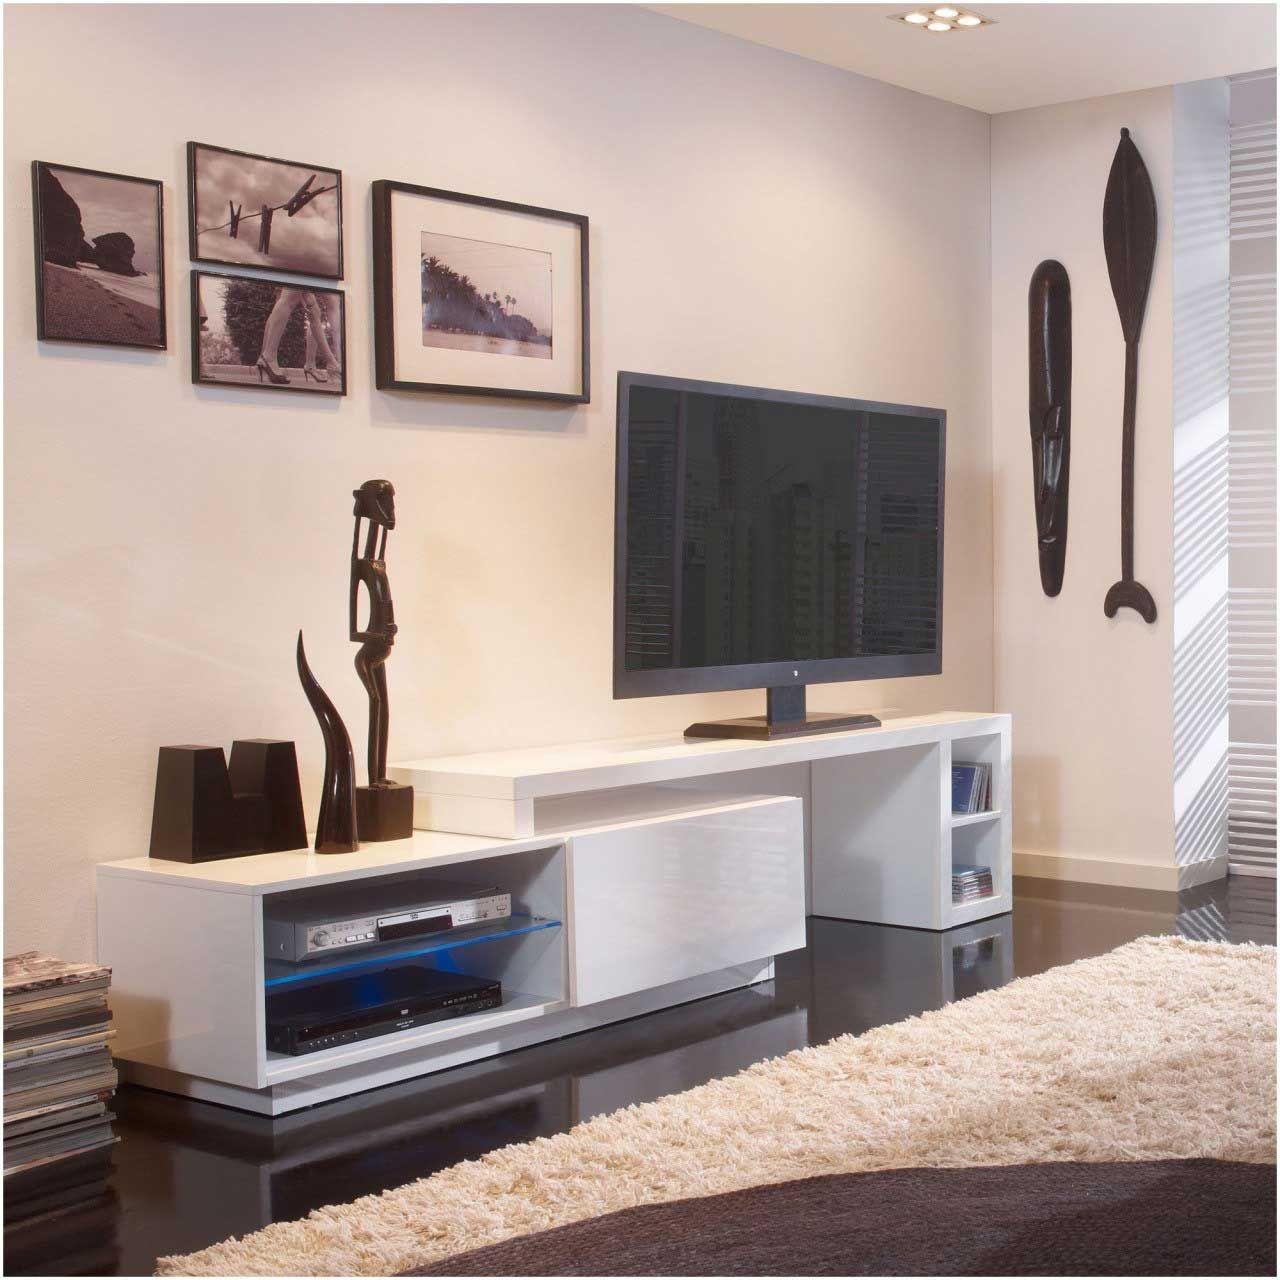 201 Meuble Tv En Verre But Meuble Tv Design But 30elegant Meuble Tv Design But Anciendemutu Of Meubl Meuble Tv Design Meuble Living Mobilier De Salon